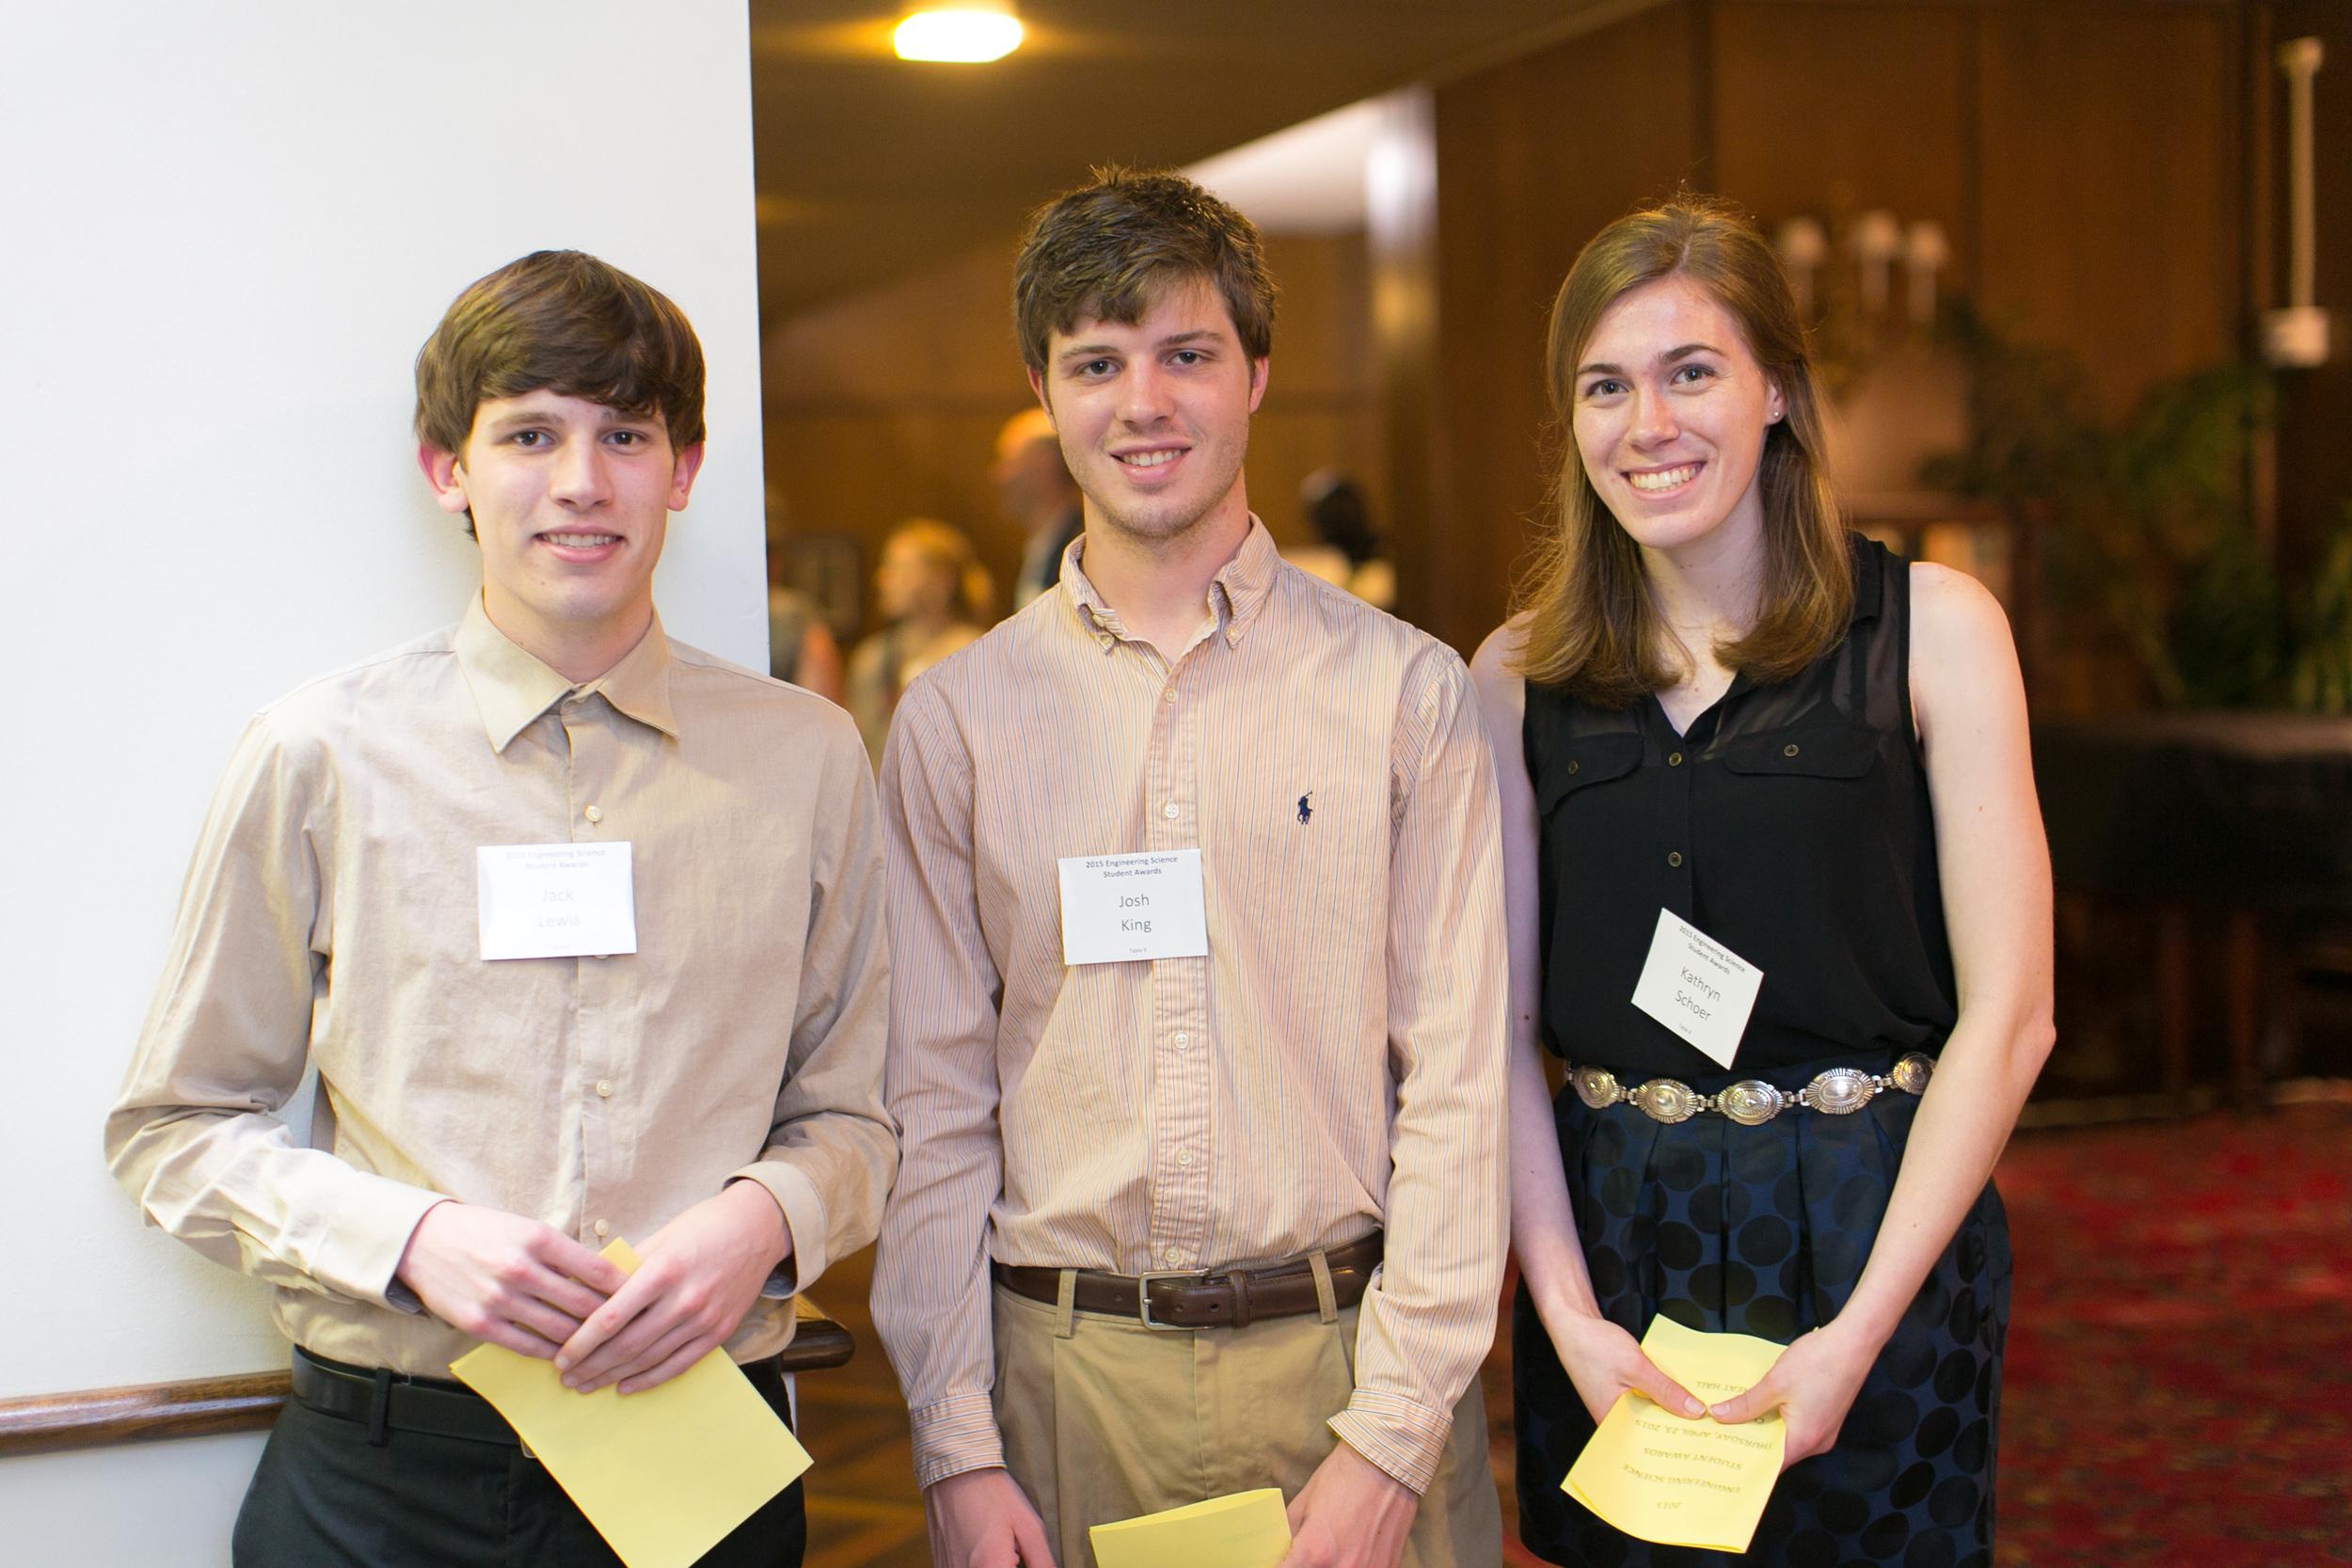 004-Engineering Awards.jpg